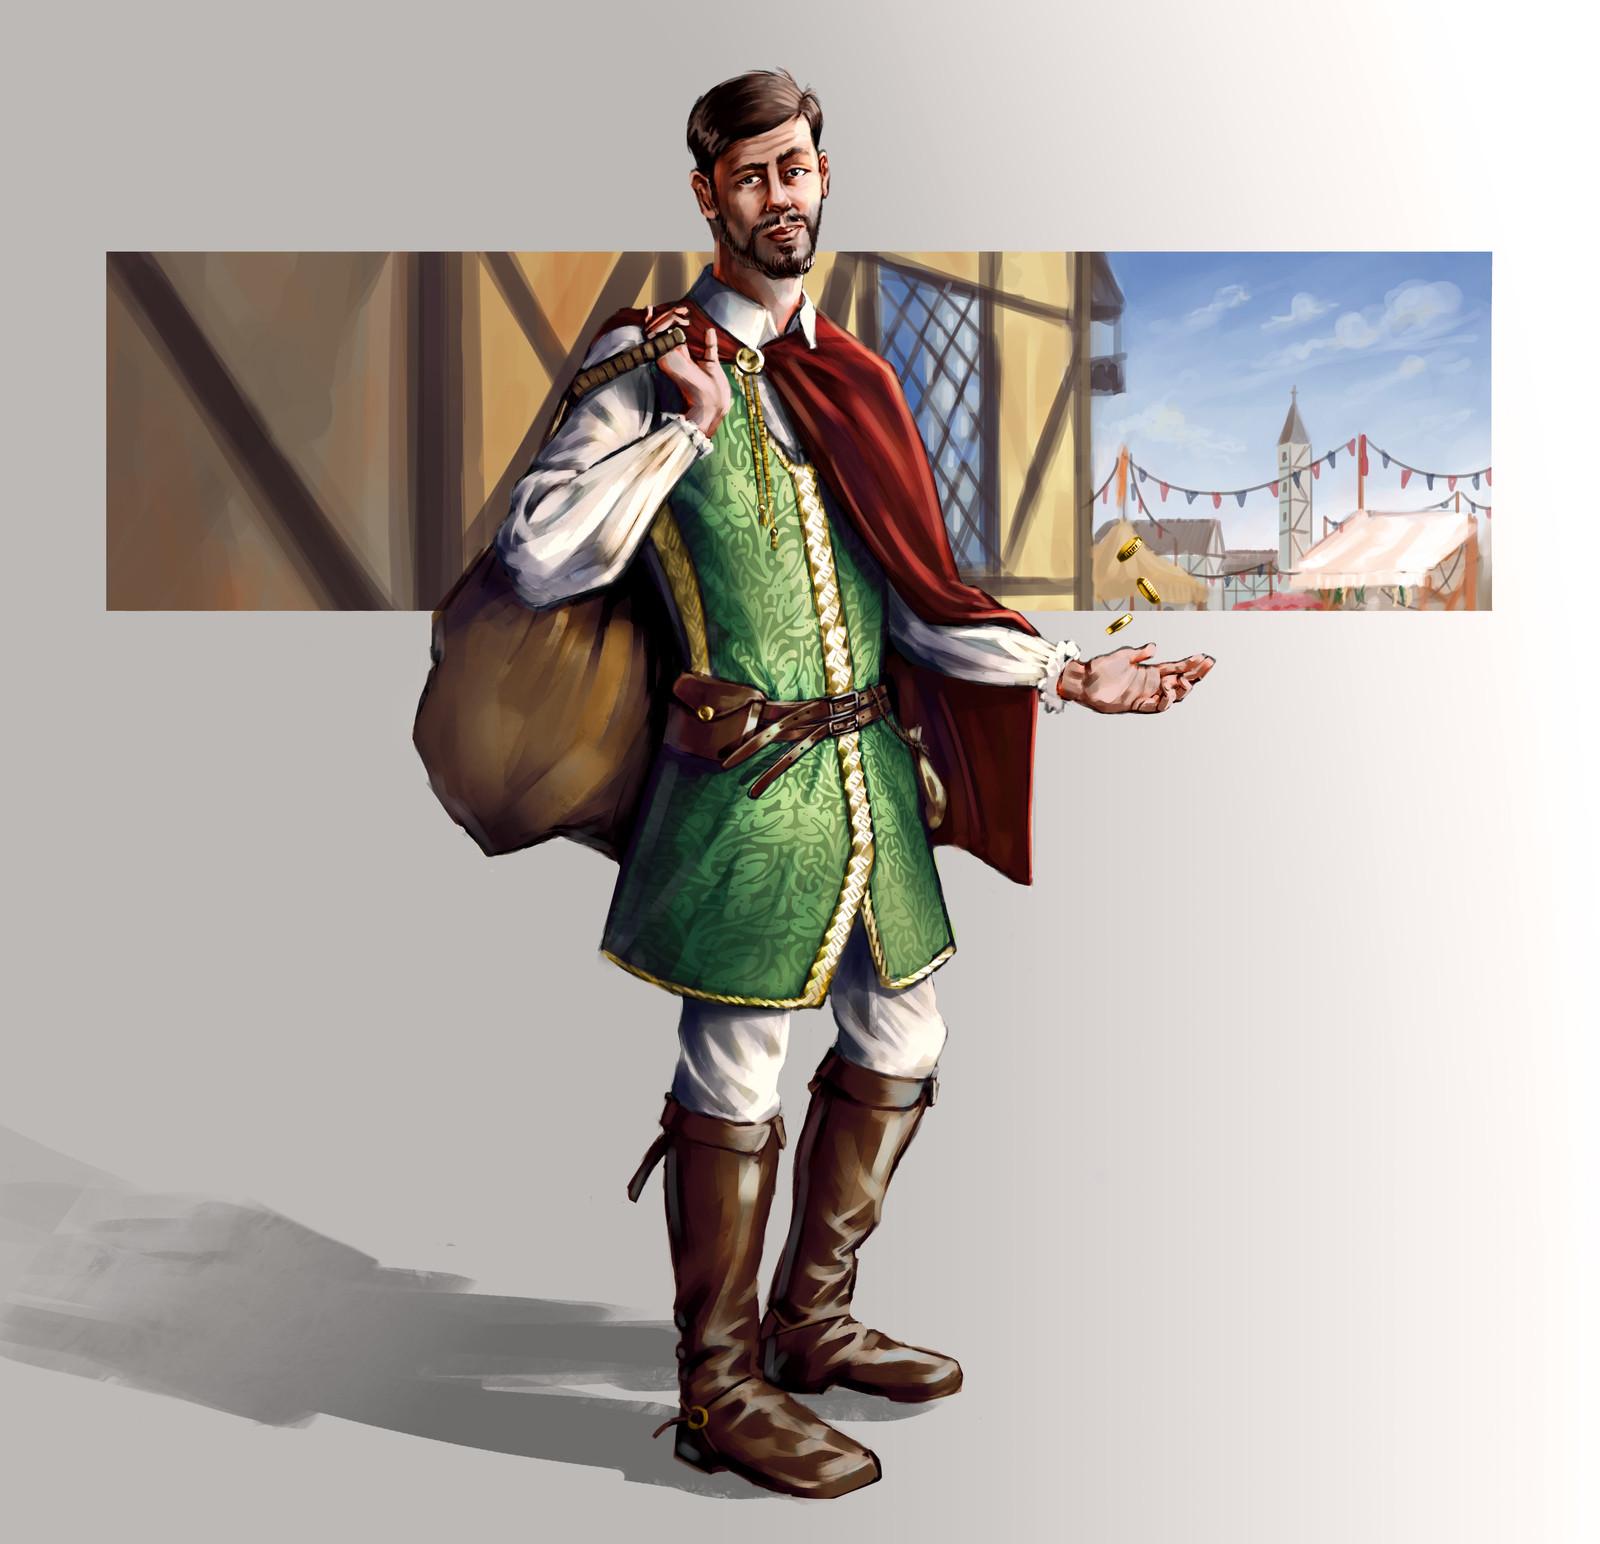 Medieval era merchant